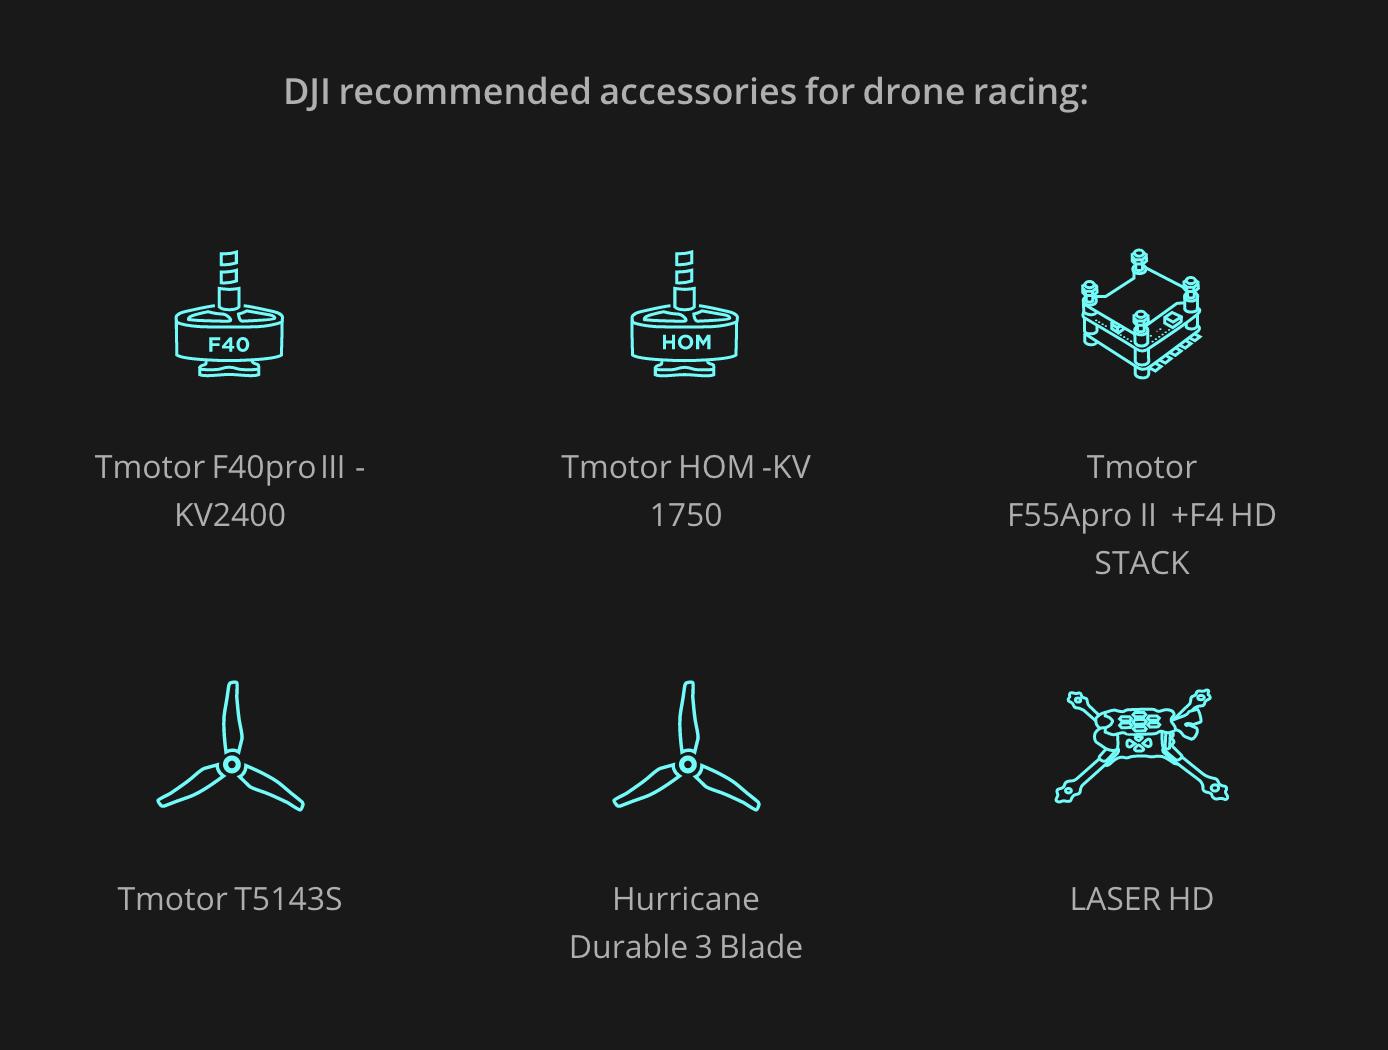 DJI shows off its Digital FPV System, a dedicated headset